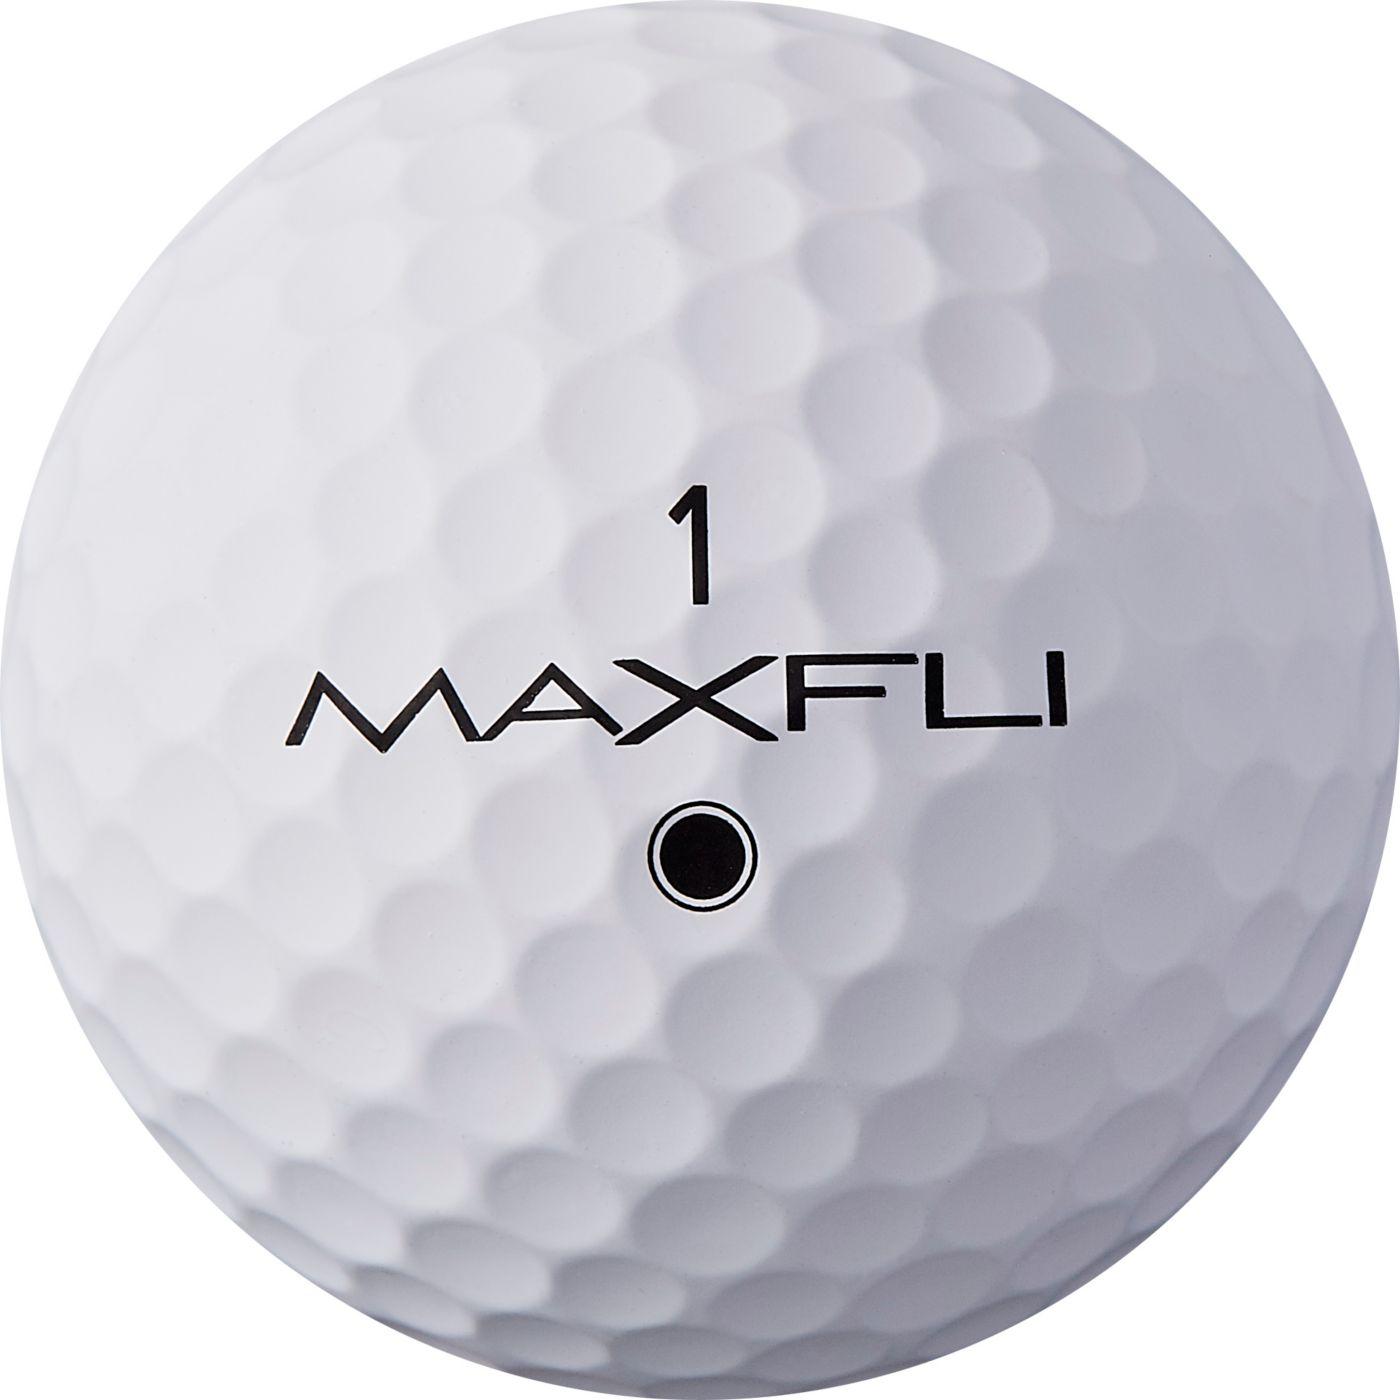 Maxfli 2019 Tour Matte White Personalized Golf Balls